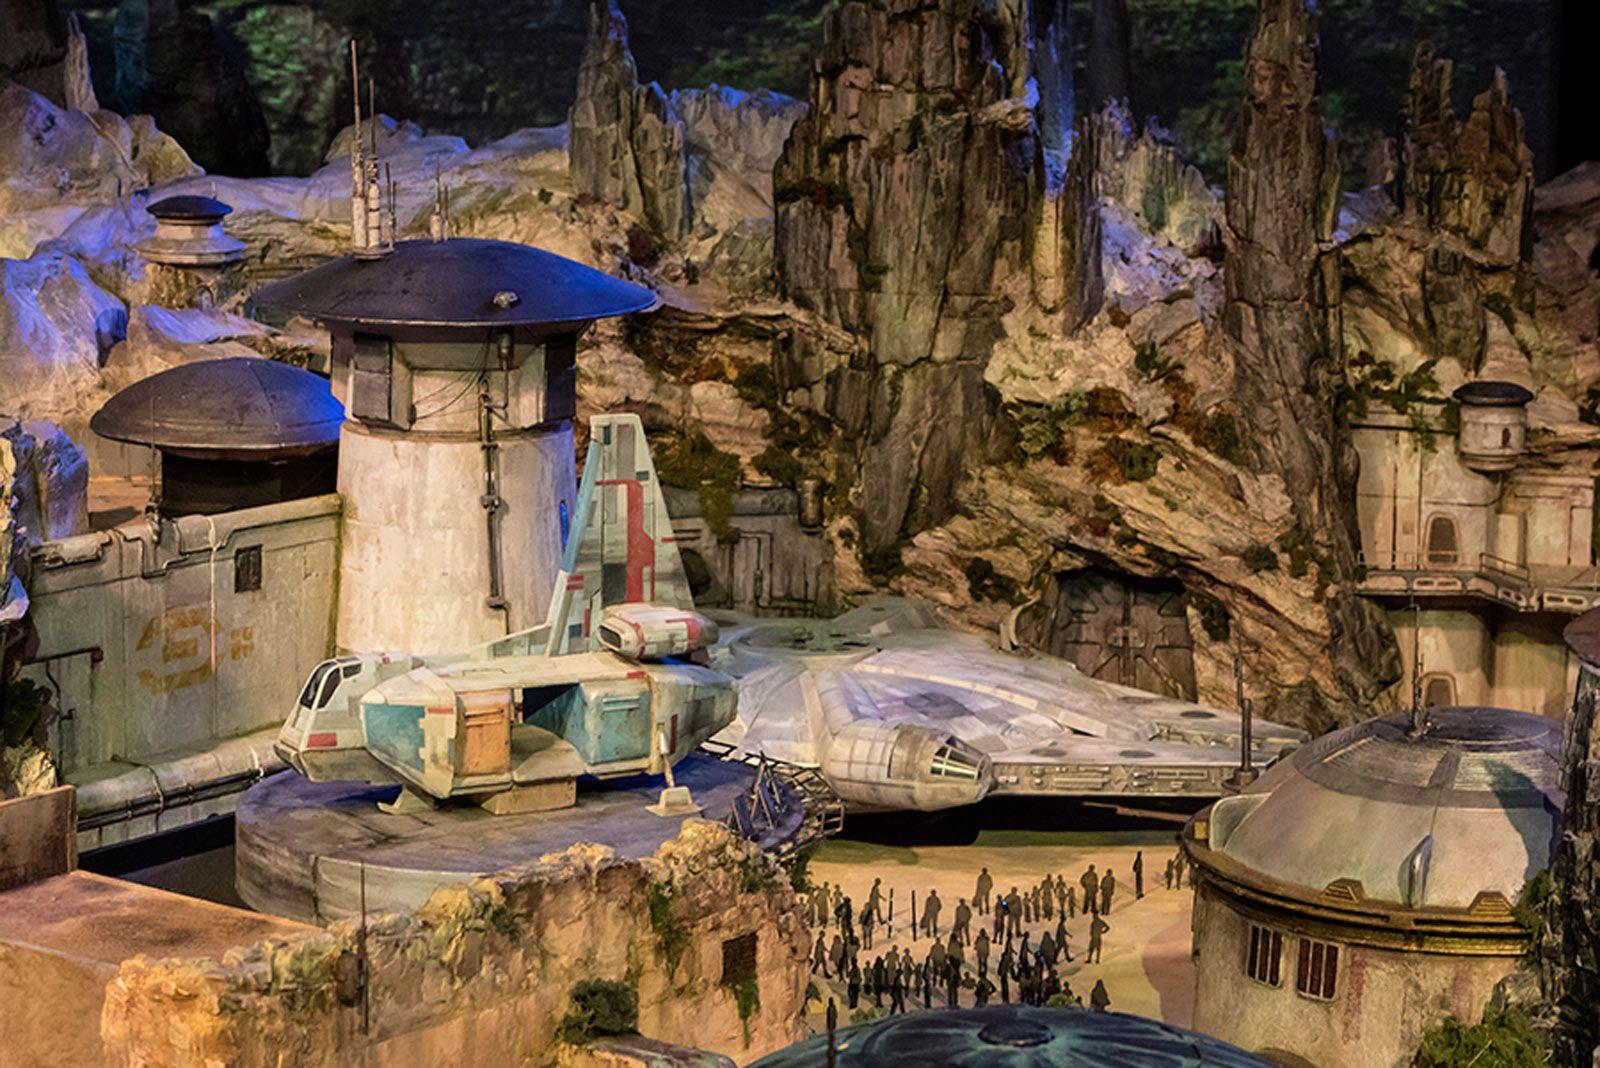 Disney S Star Wars Theme Park Is Taking Shape Disney Star Wars